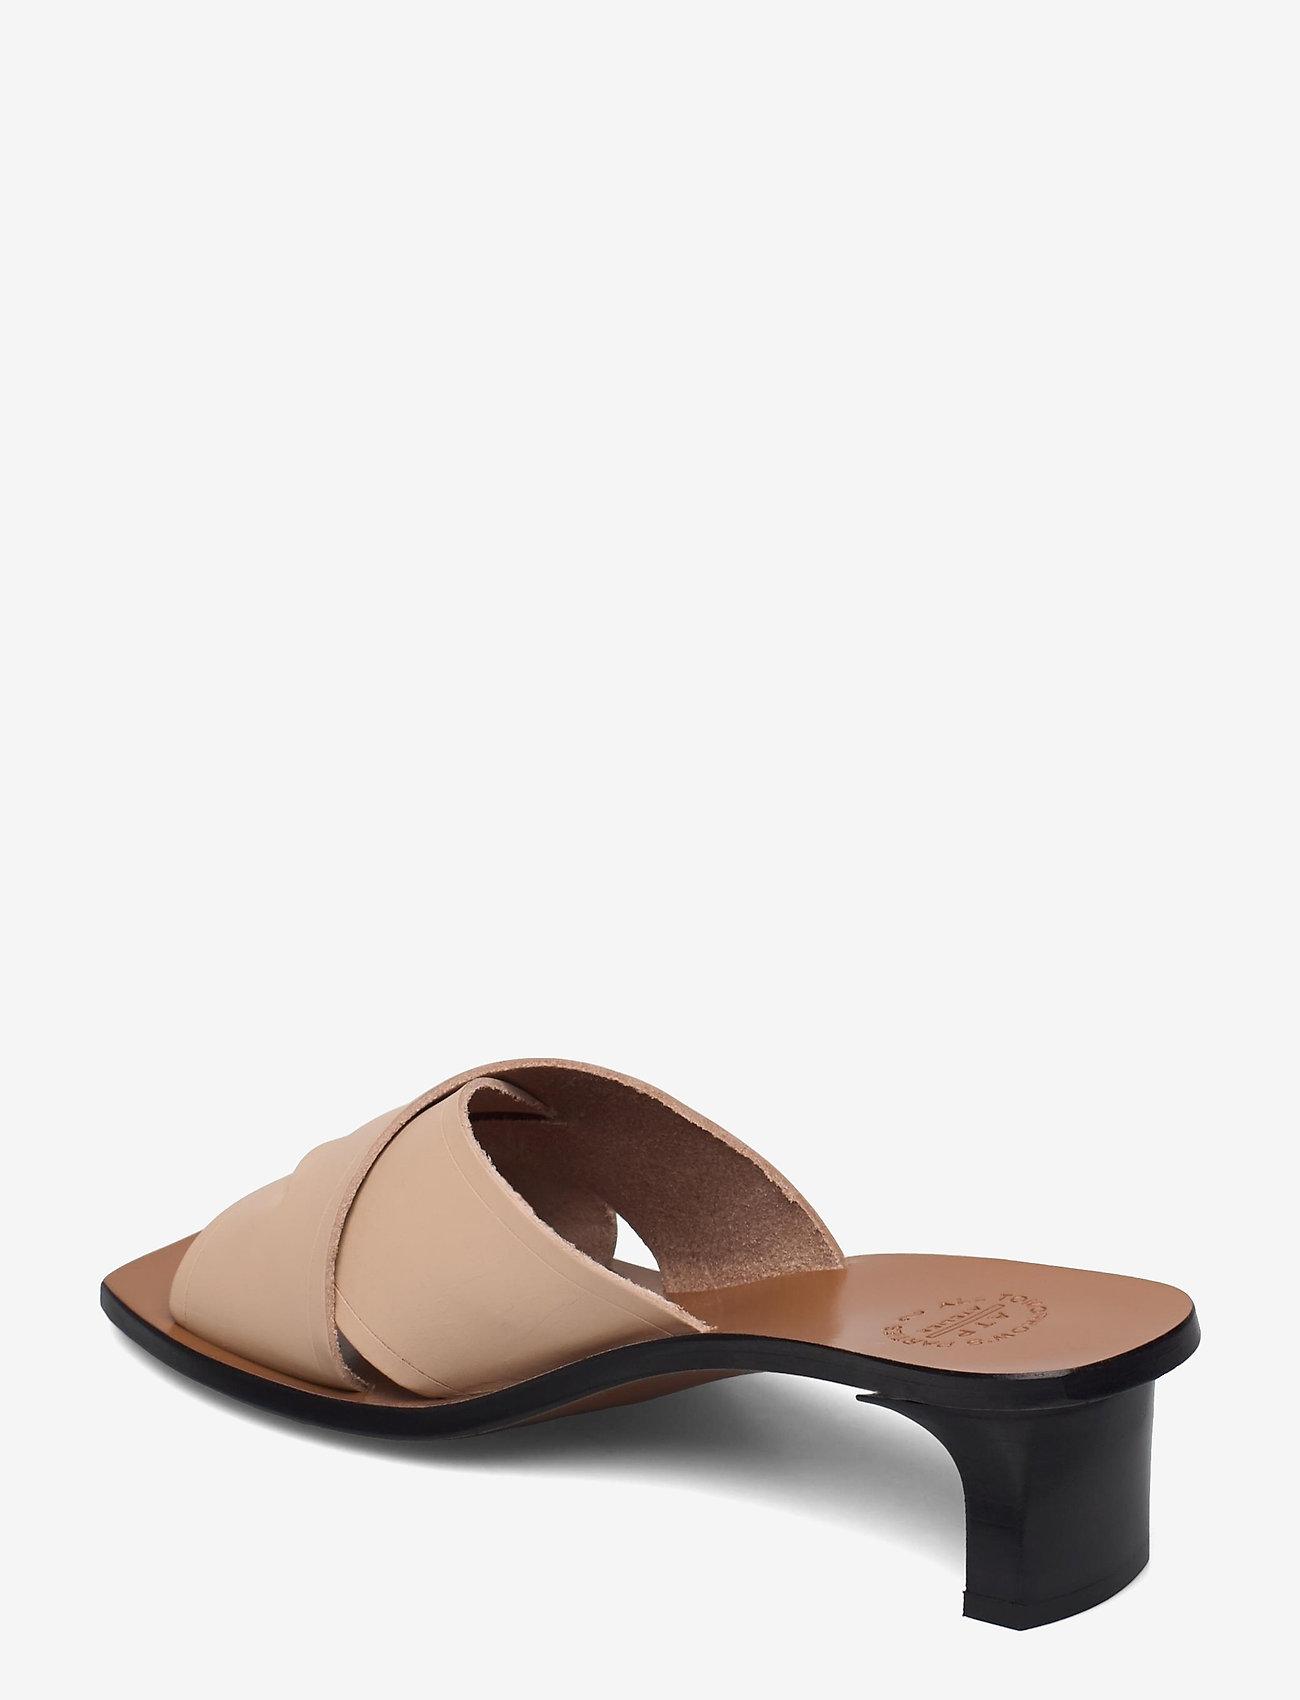 ATP Atelier - Stornarella Sand Vacchetta - heeled sandals - sand - 2